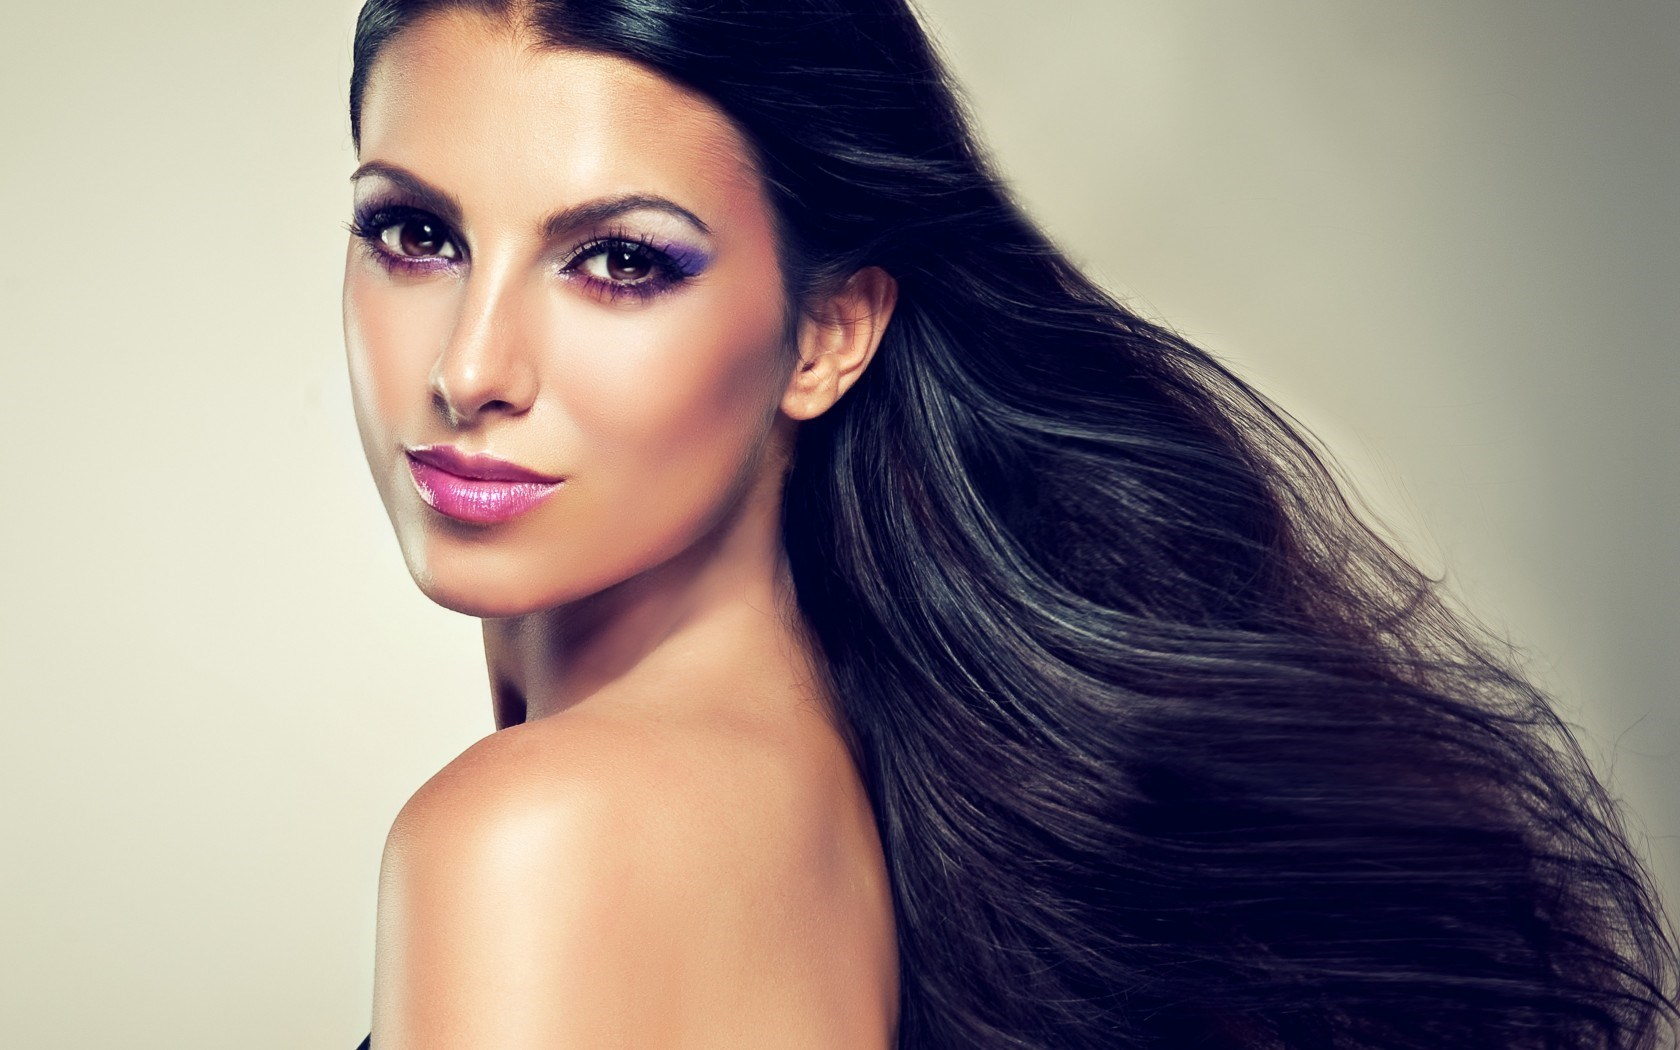 Brunette Style Makeup